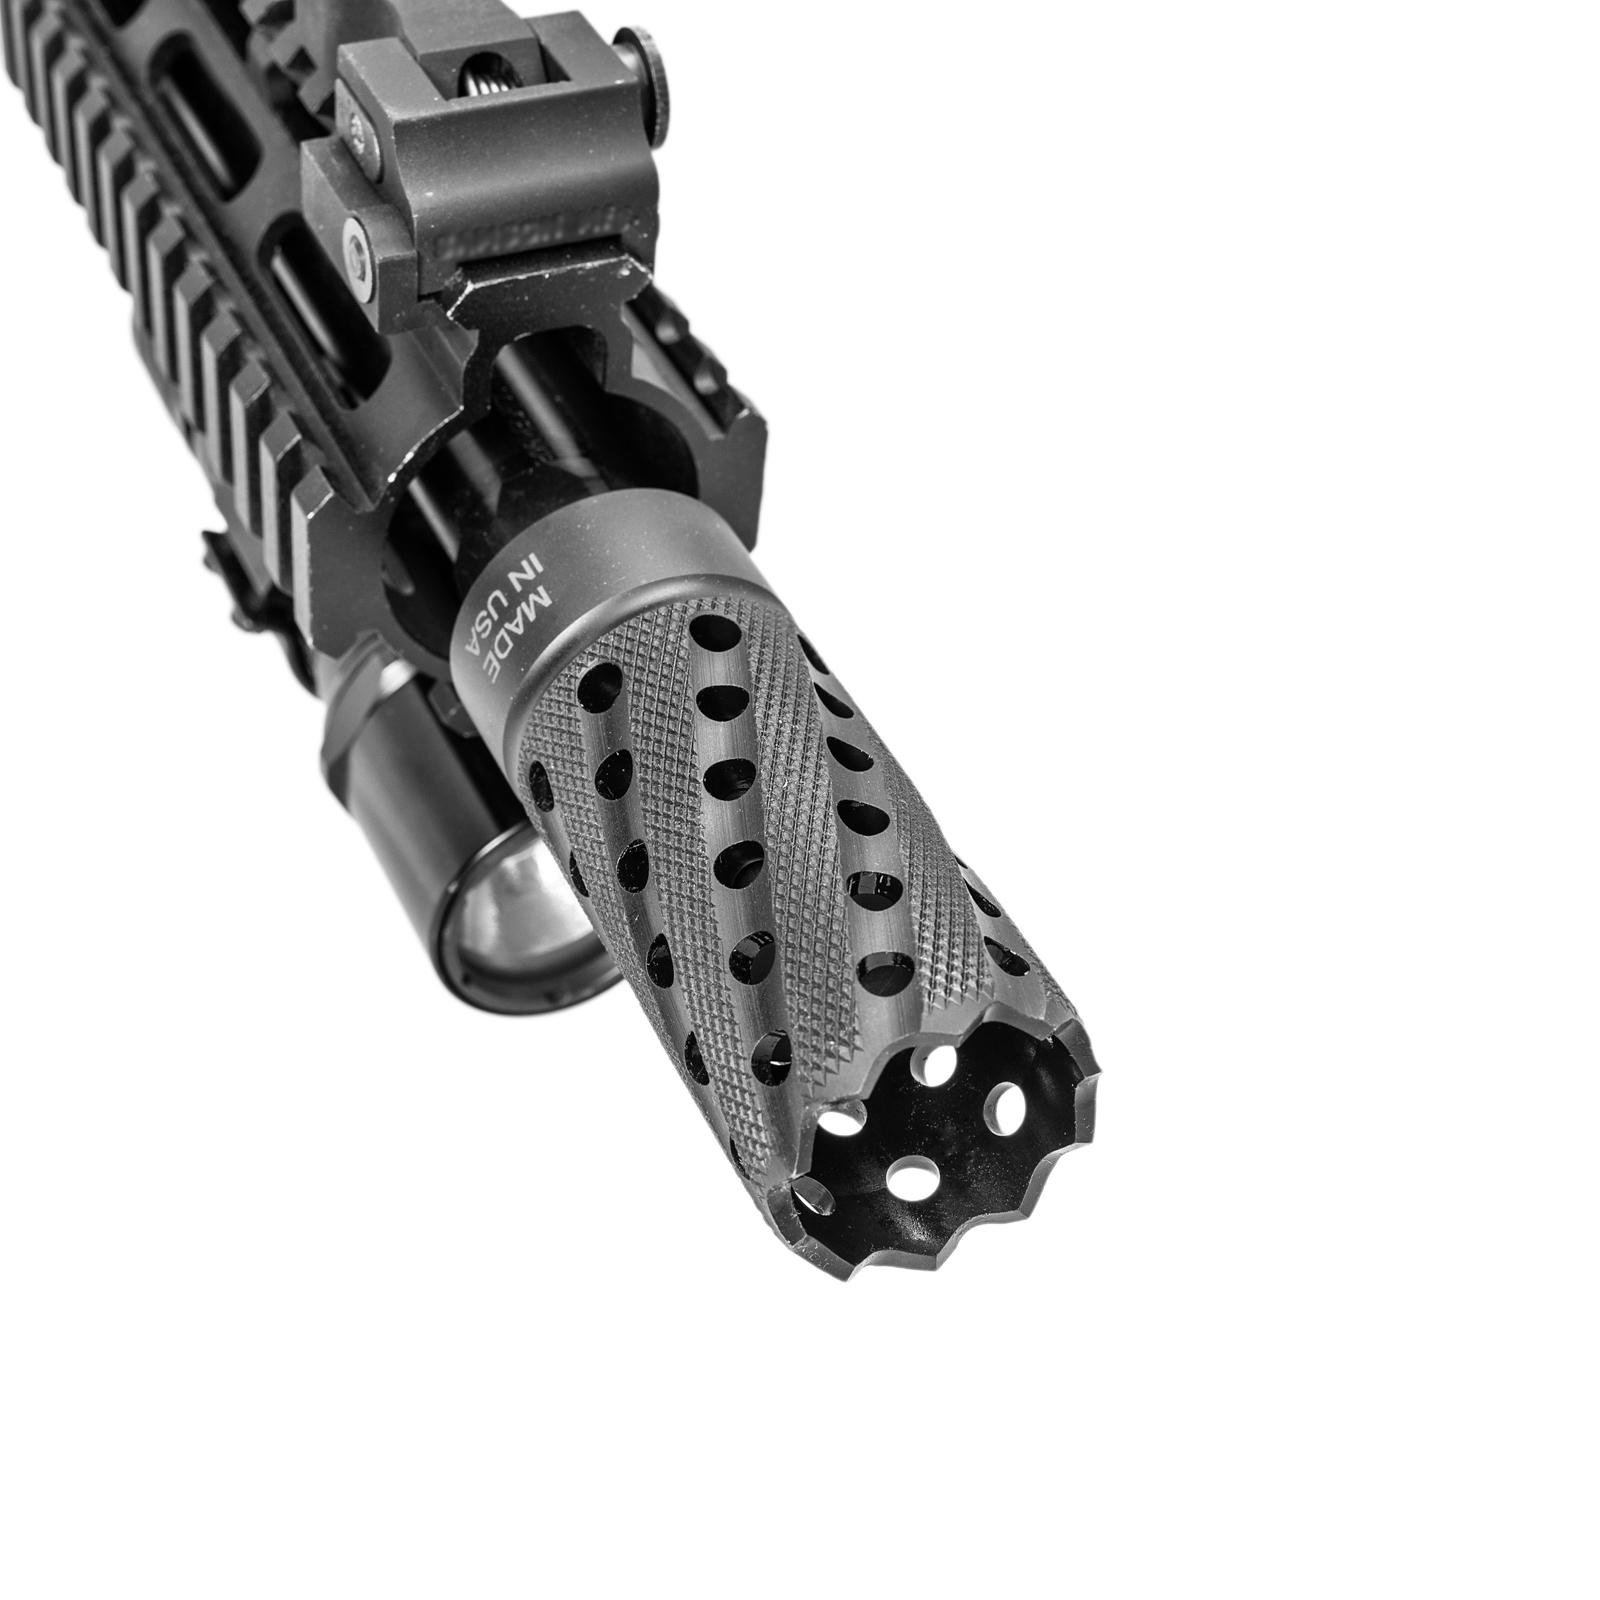 Helical Port Muzzle Brake for 12 gauge Shotgun, TMULC or MULC systems